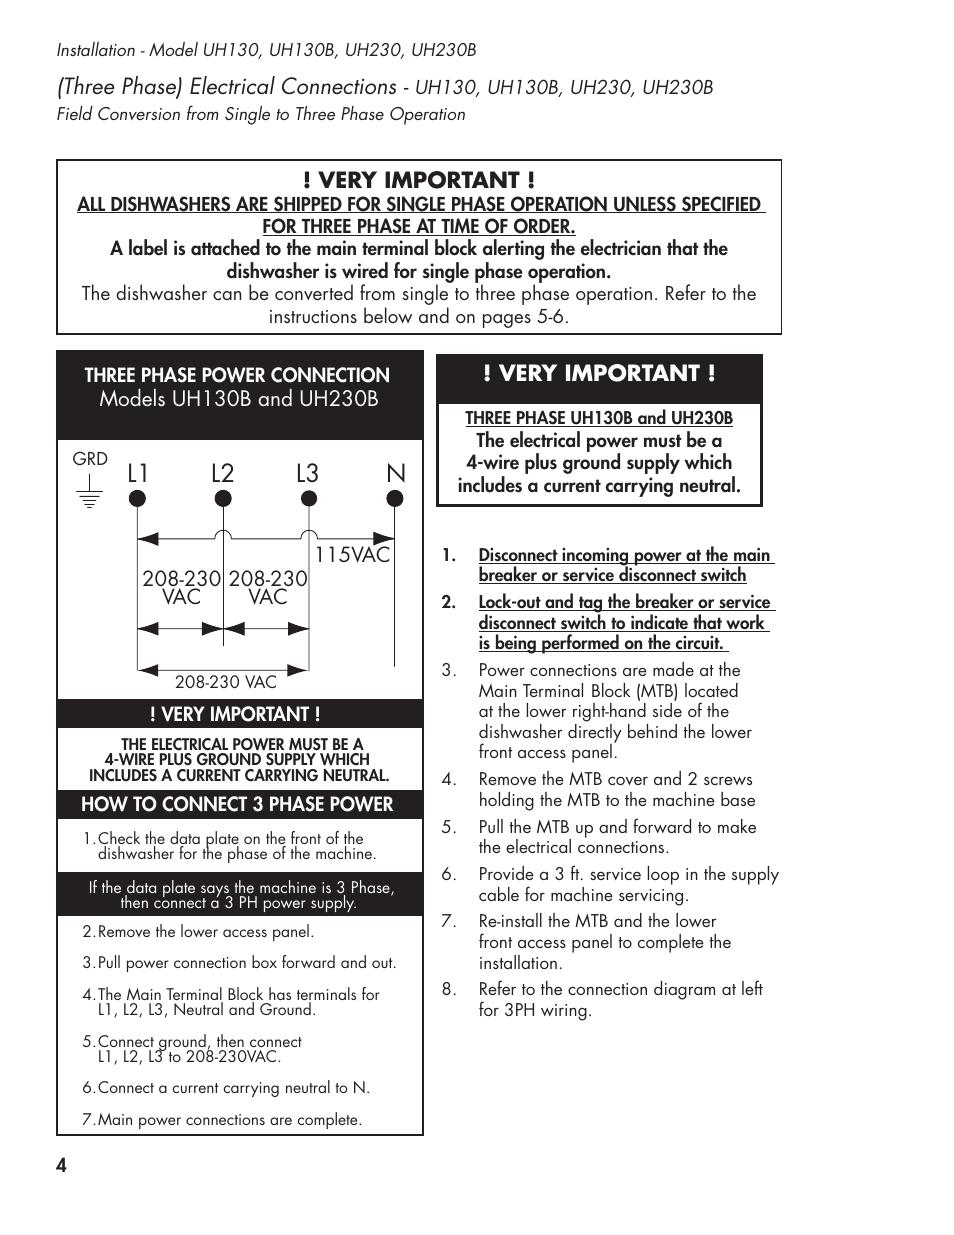 Champion Dish Machine Wiring Diagram Worksheet And 722 Receiver L1 L2 L3 N Ul 130 Manual User Page 14 116 Rh Manualsdir Com Network Installation Diagrams Hopper